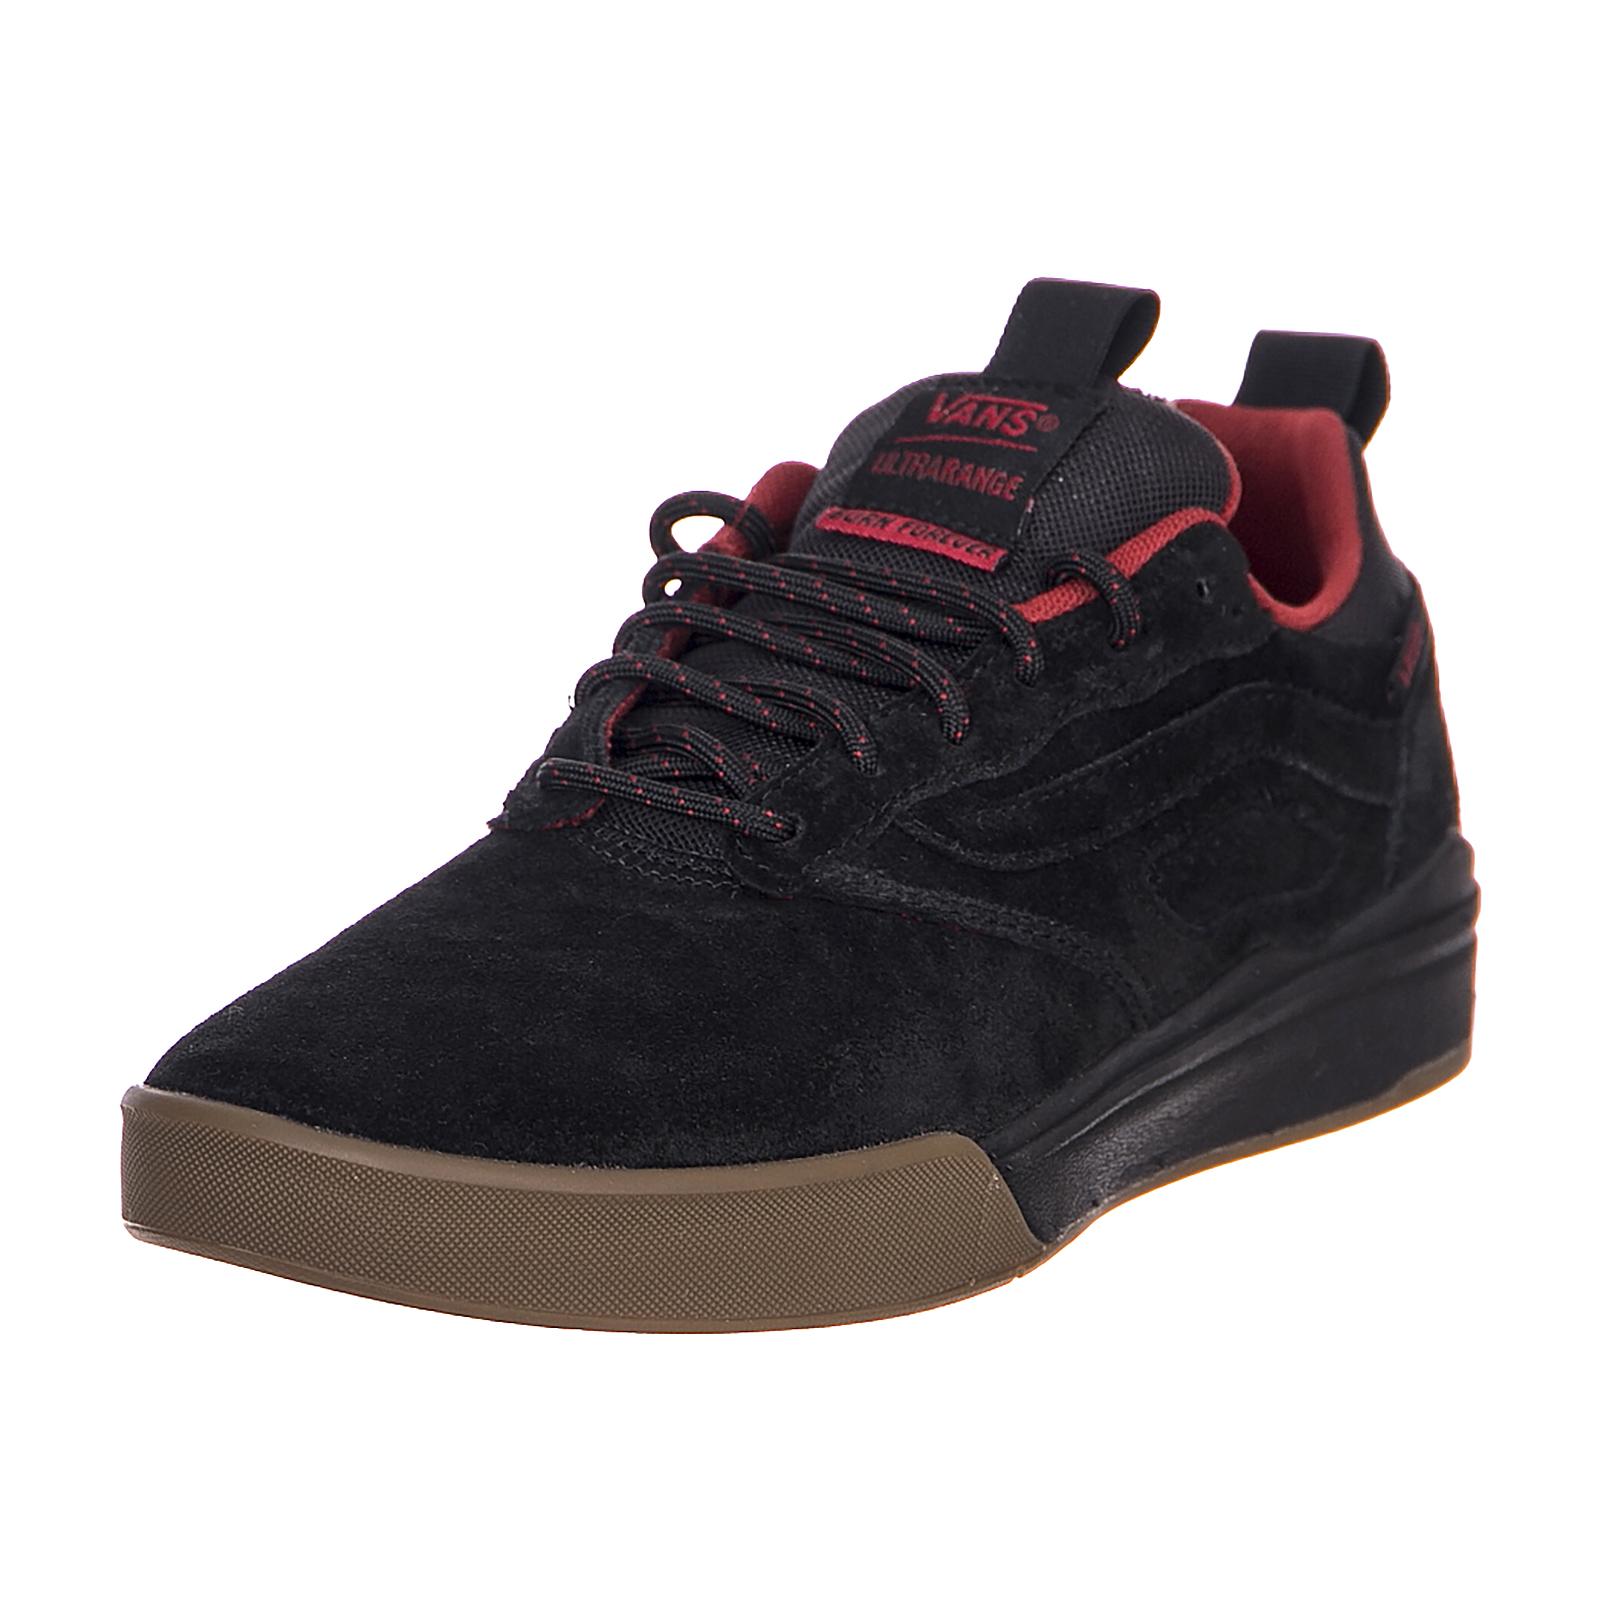 a0d589186a7 Vans Sneakers Mn Ultrarange Pro (Spitfire) Black